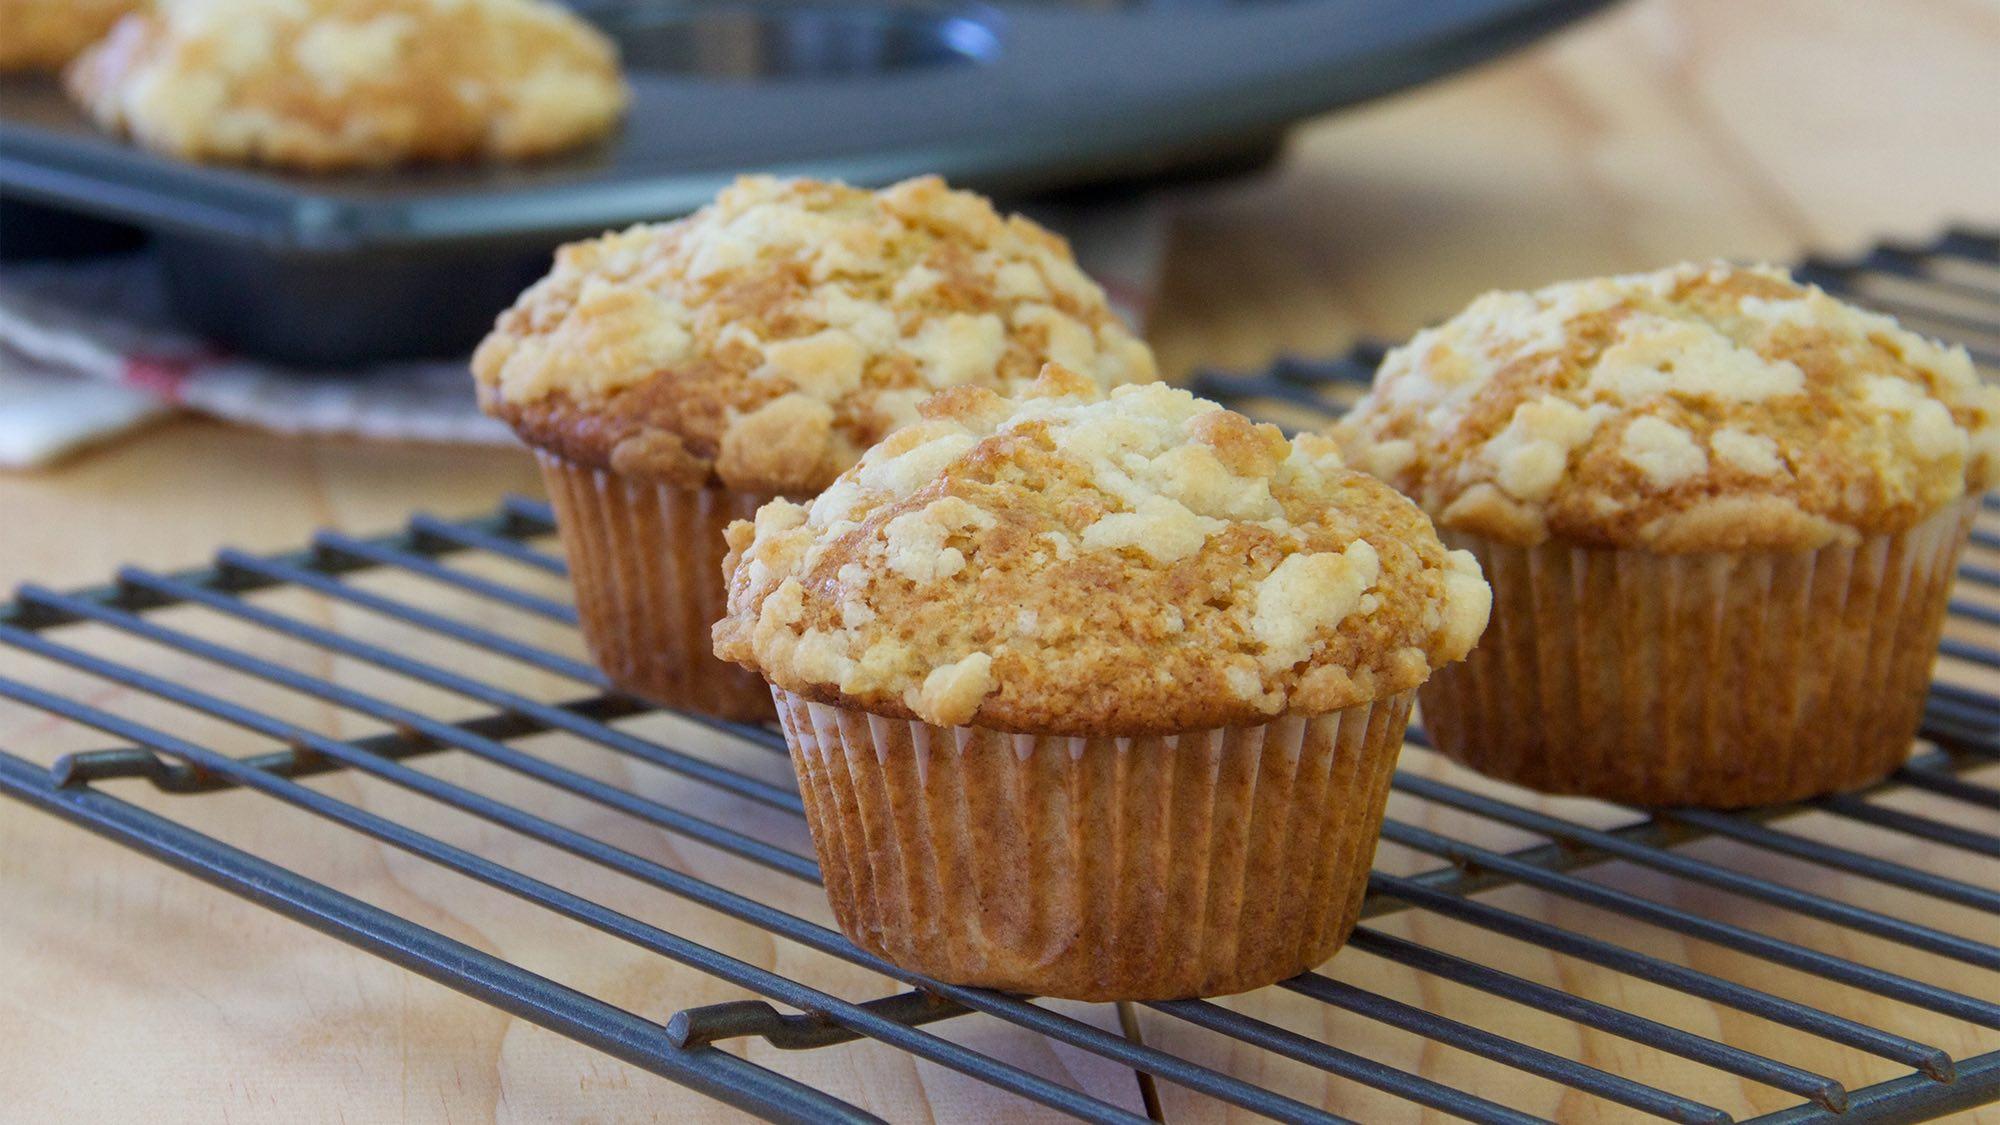 McCormick Cinnamon Crumb Muffins